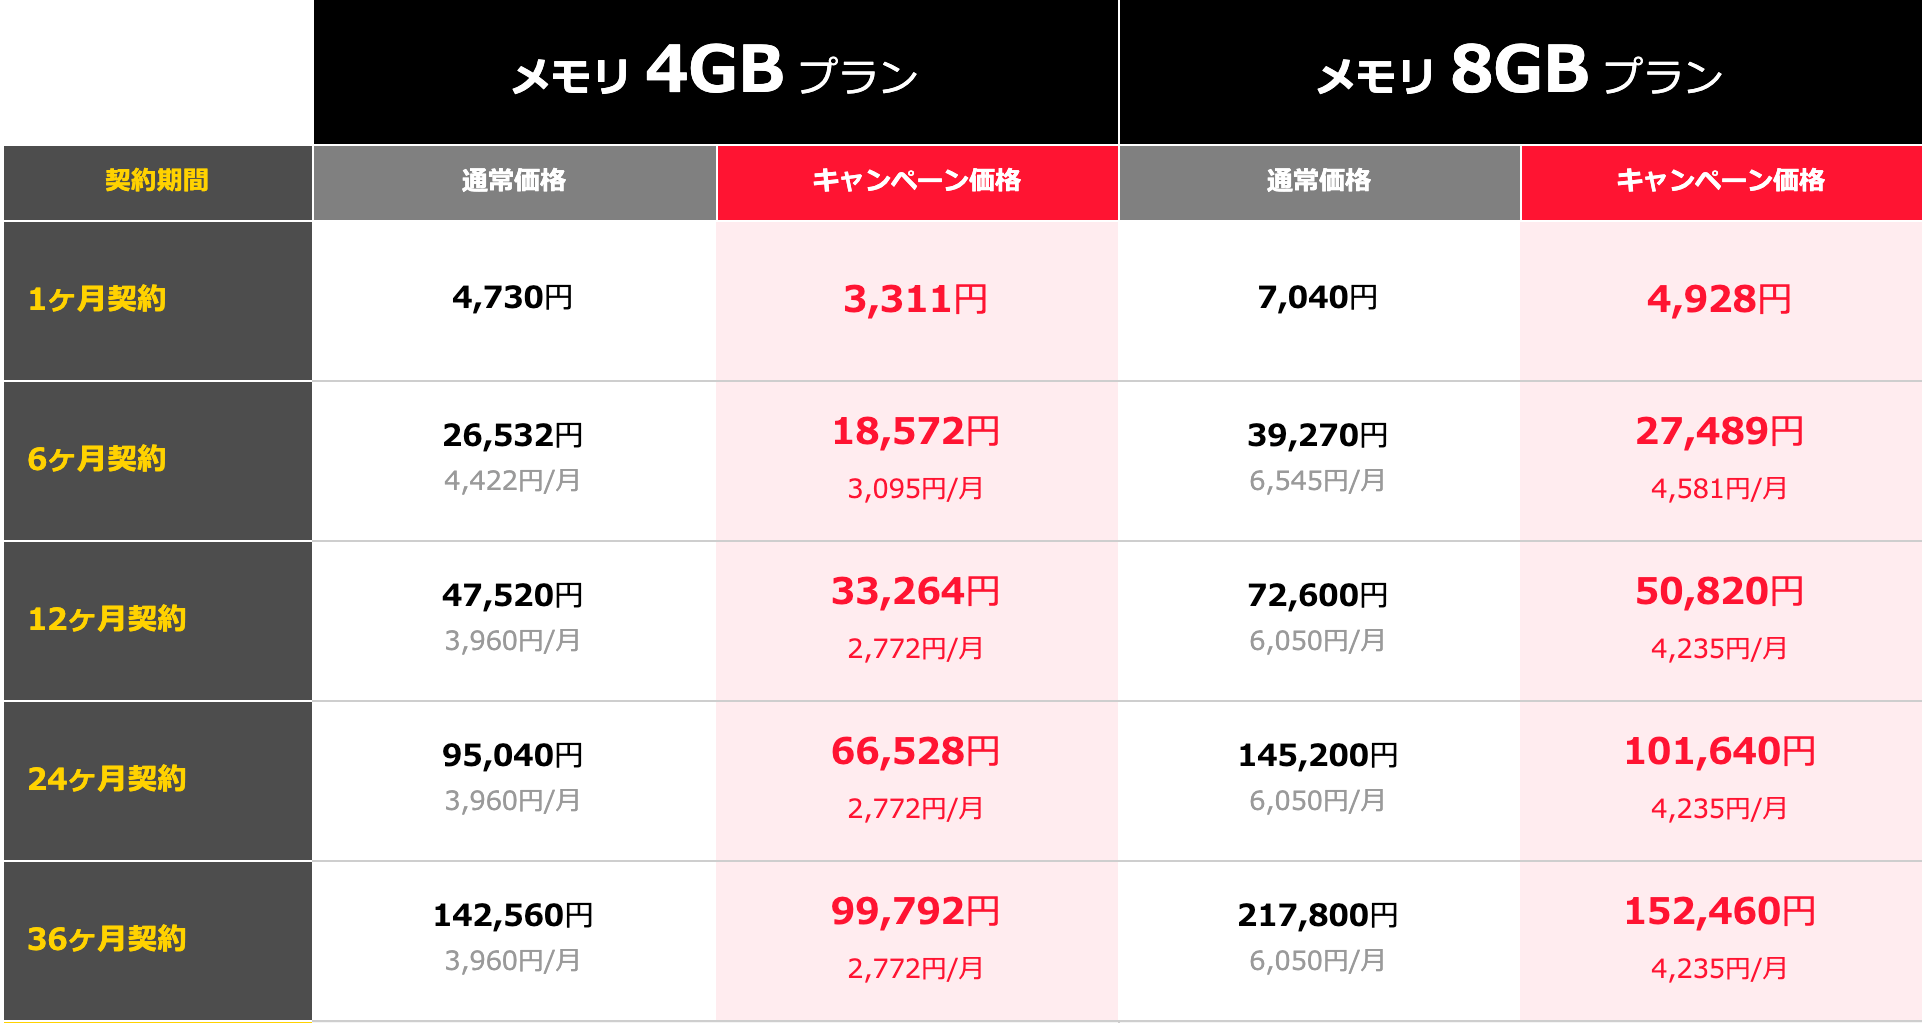 4GB・8GBプランの価格